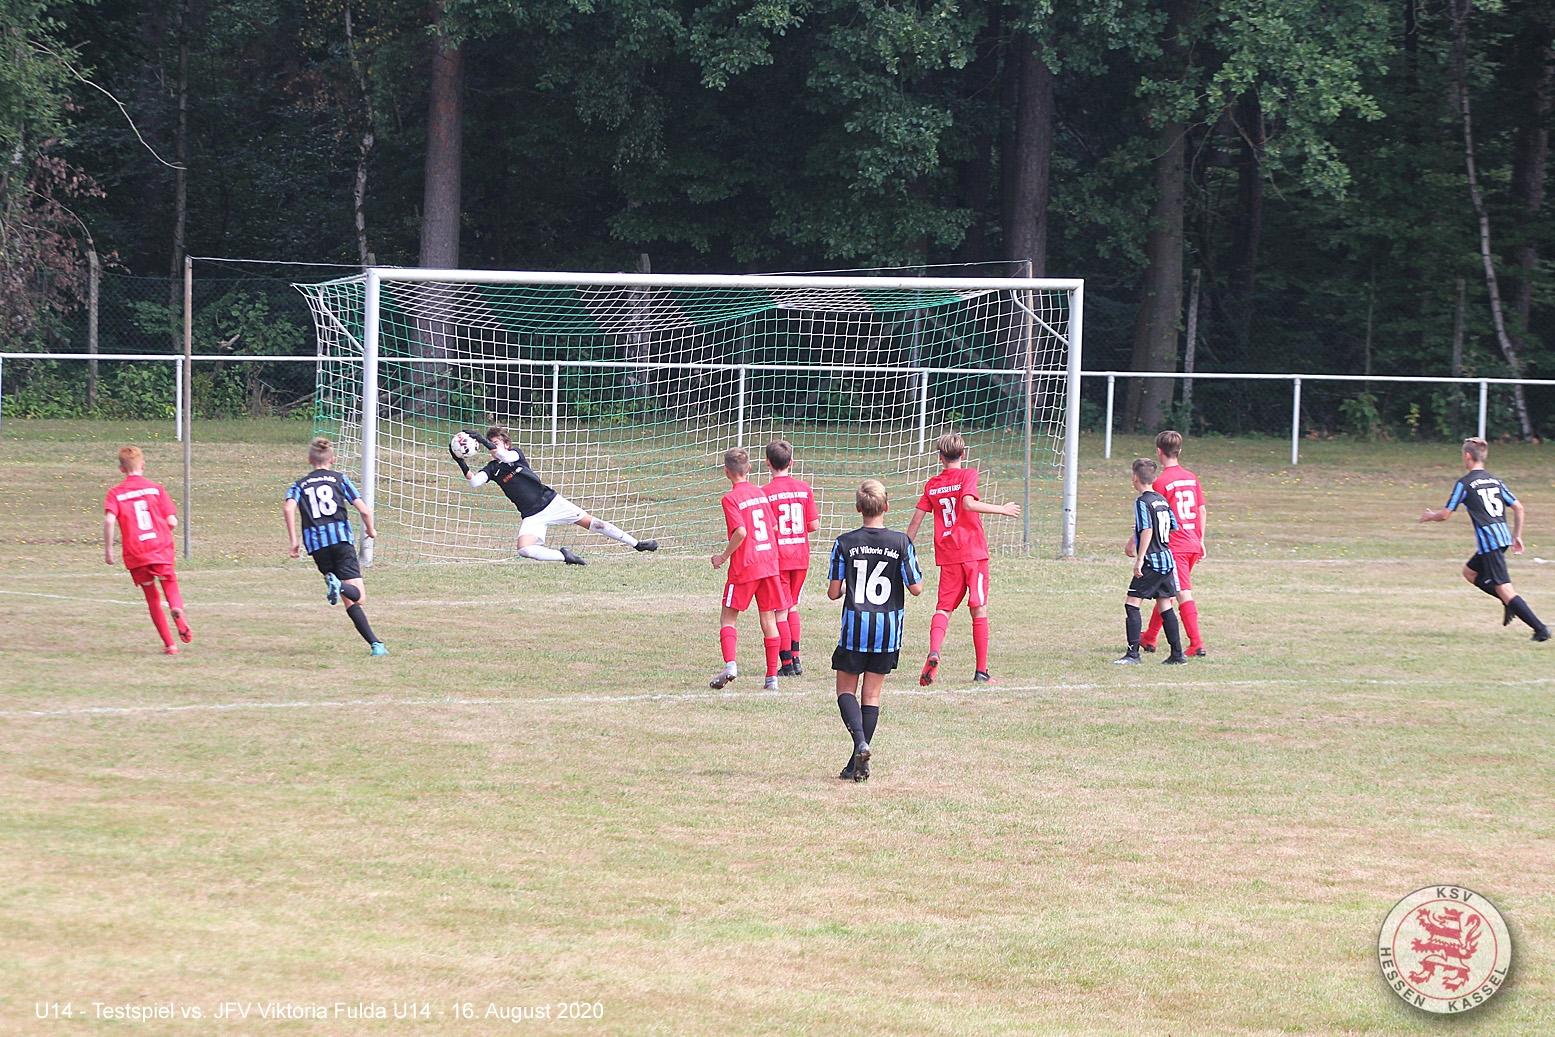 JFV Viktoria Fulda II - U14